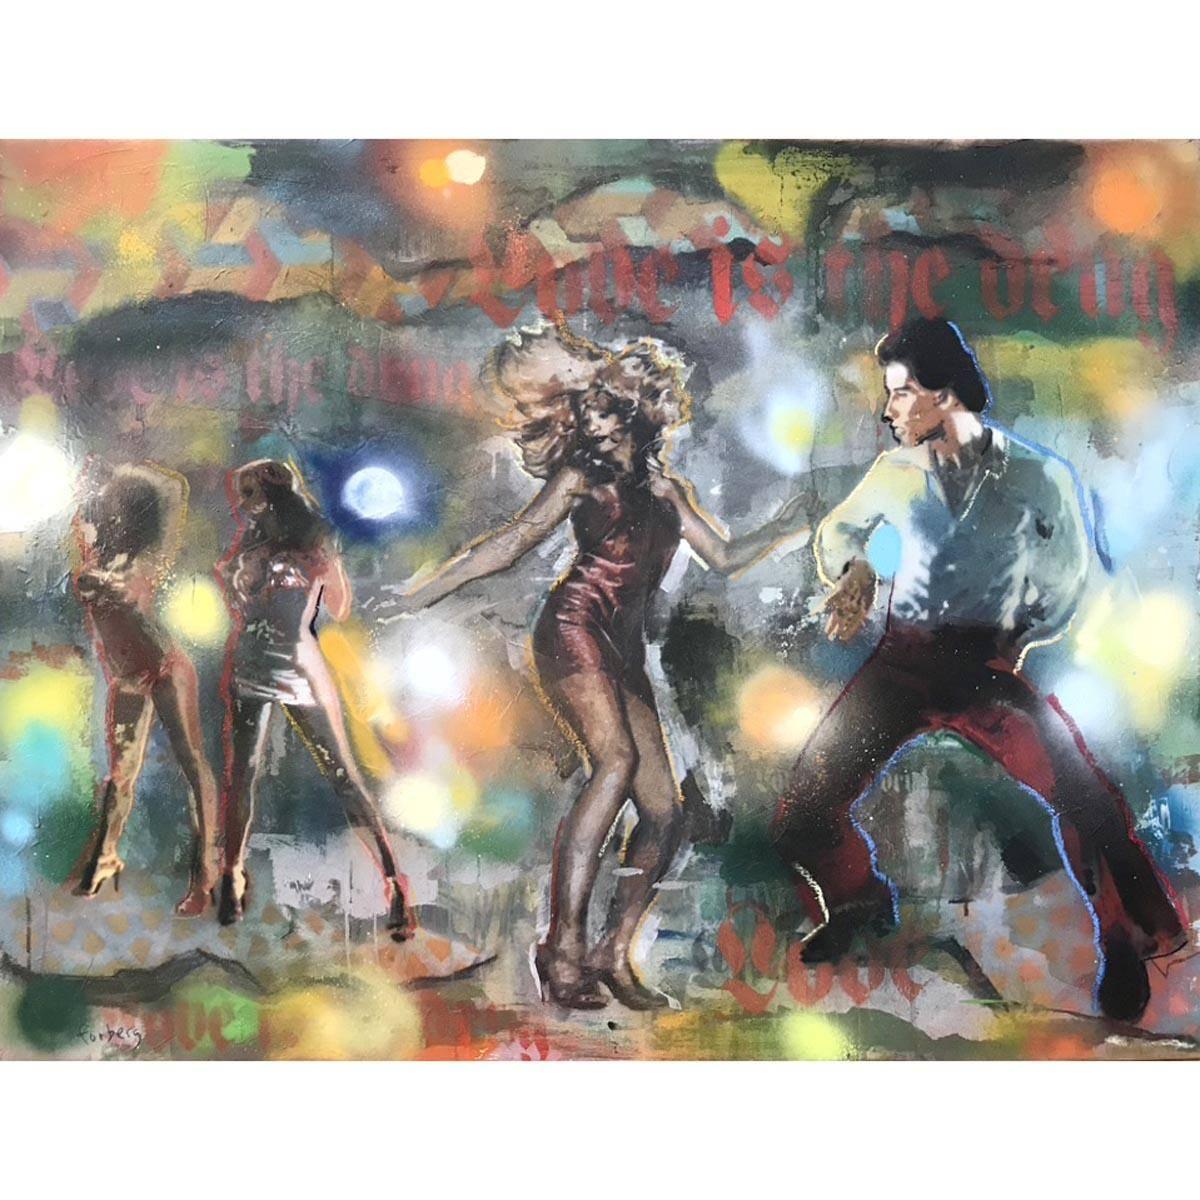 Love is the drug, 120x90 maleri spray/stencil